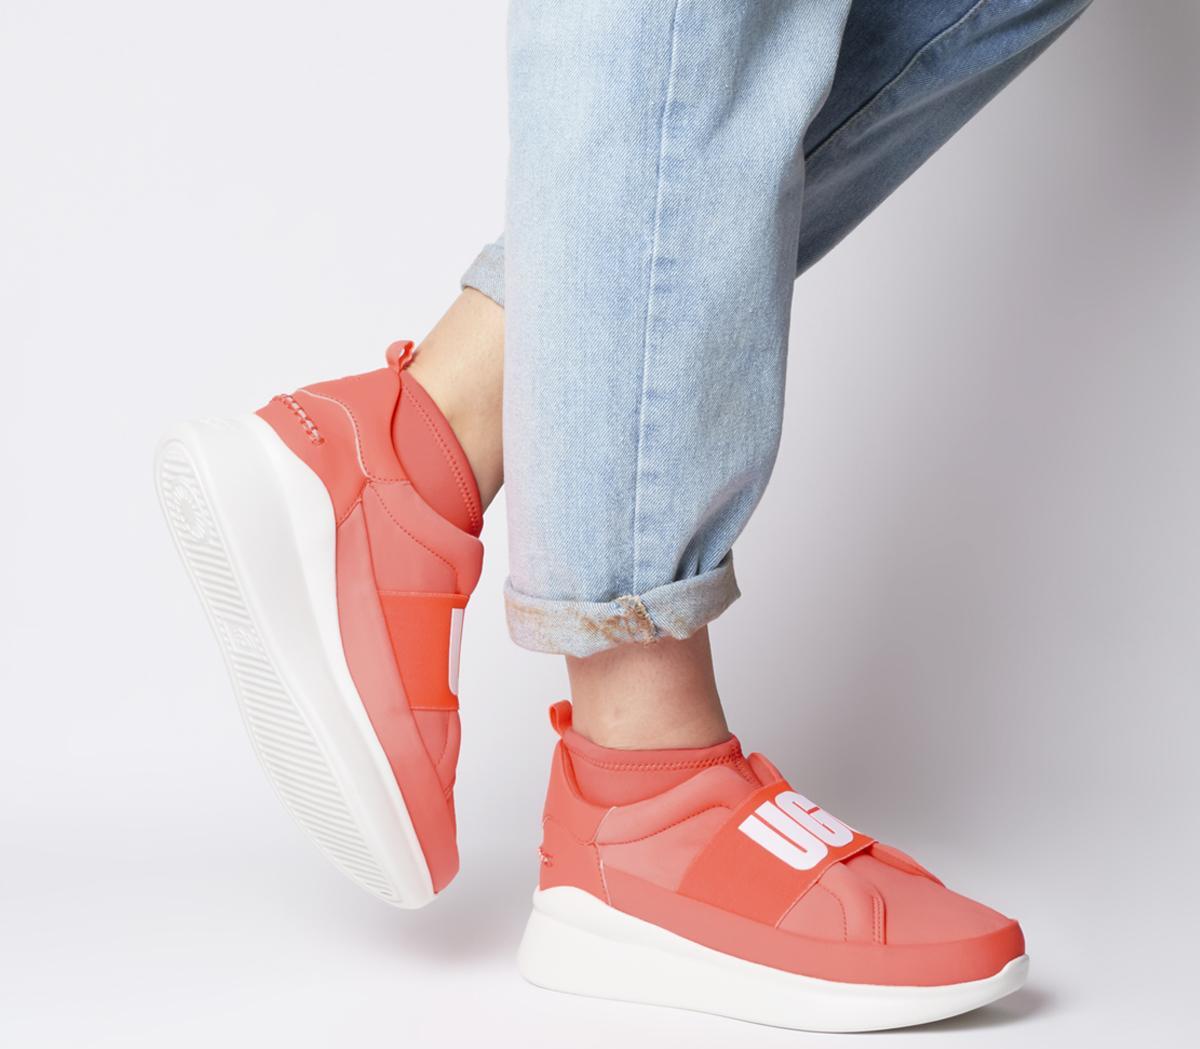 Neutra Sneakers